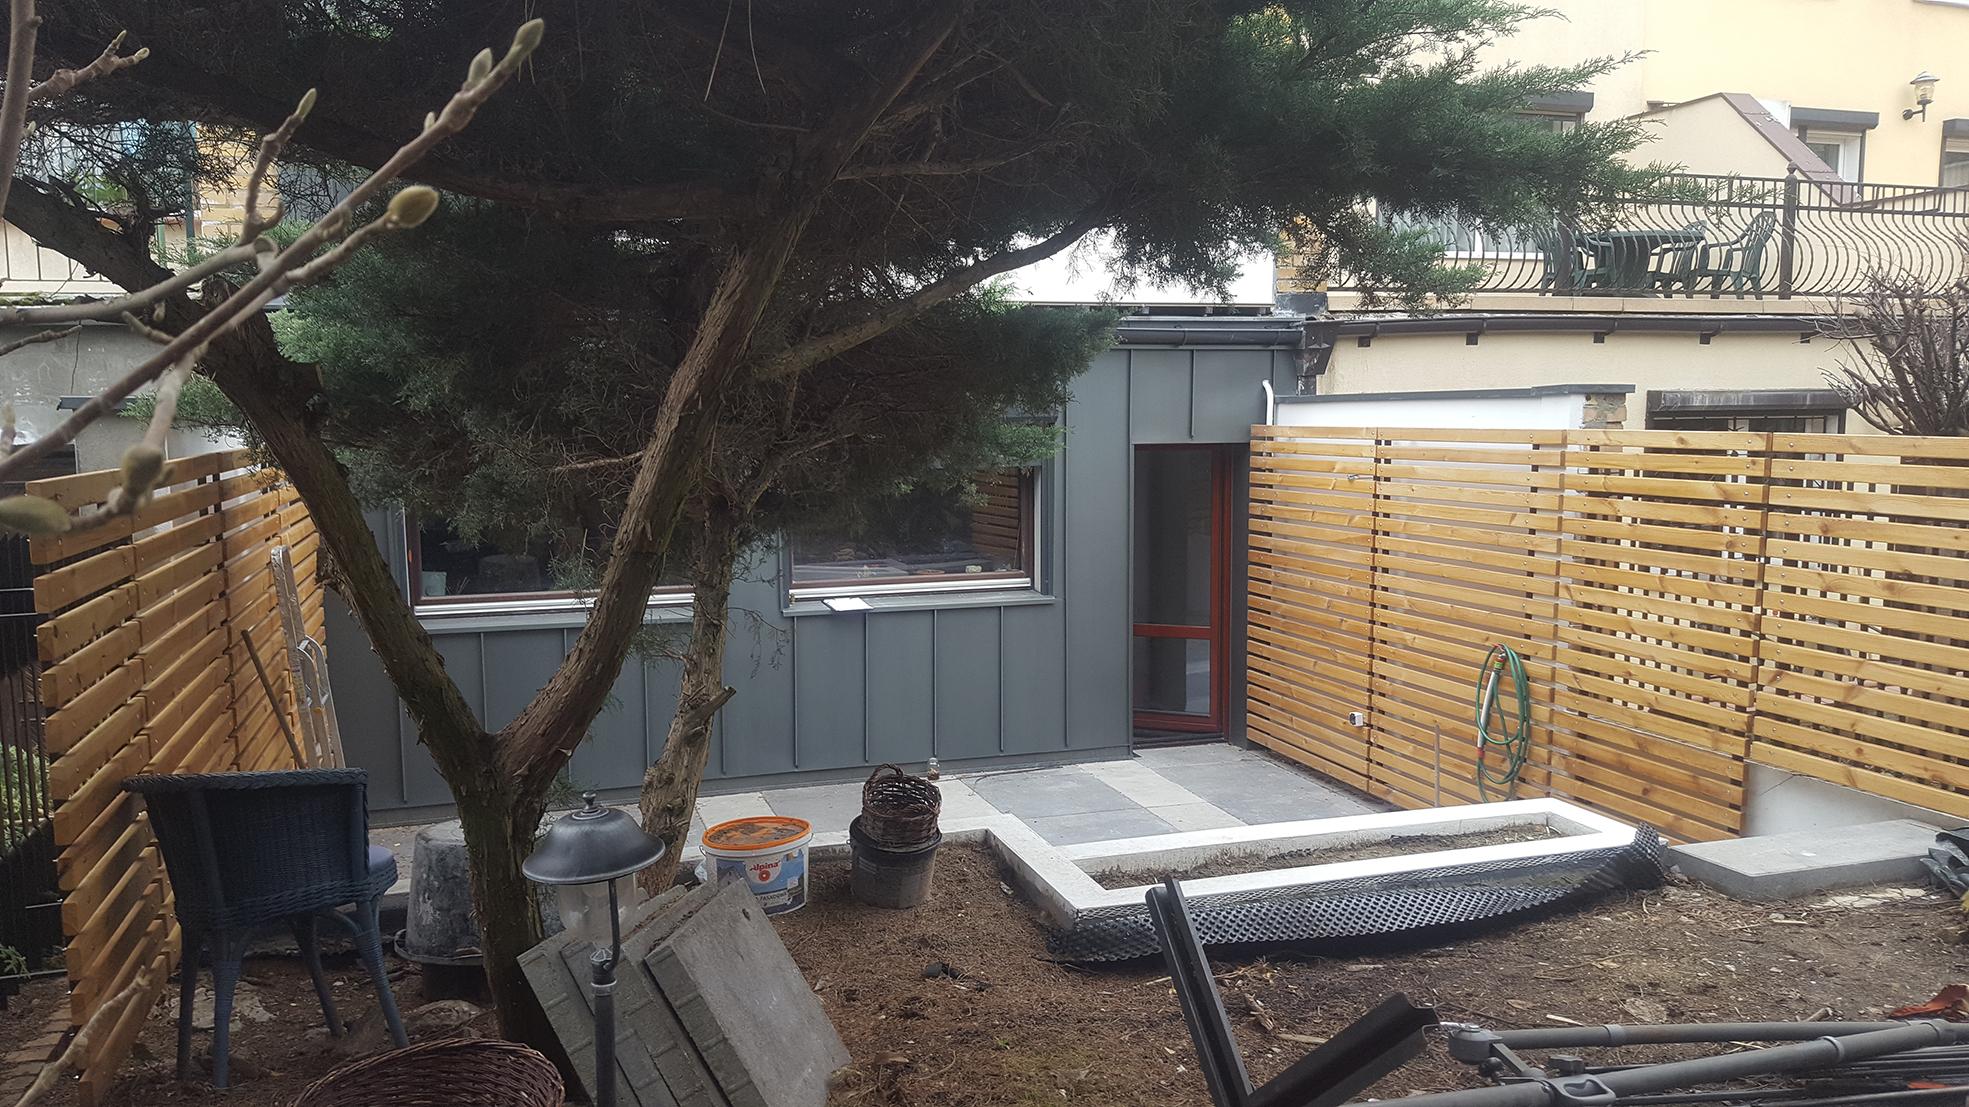 mala-zahrada-praha-navhr-projekt-zahrady-praha-rockandflower studio